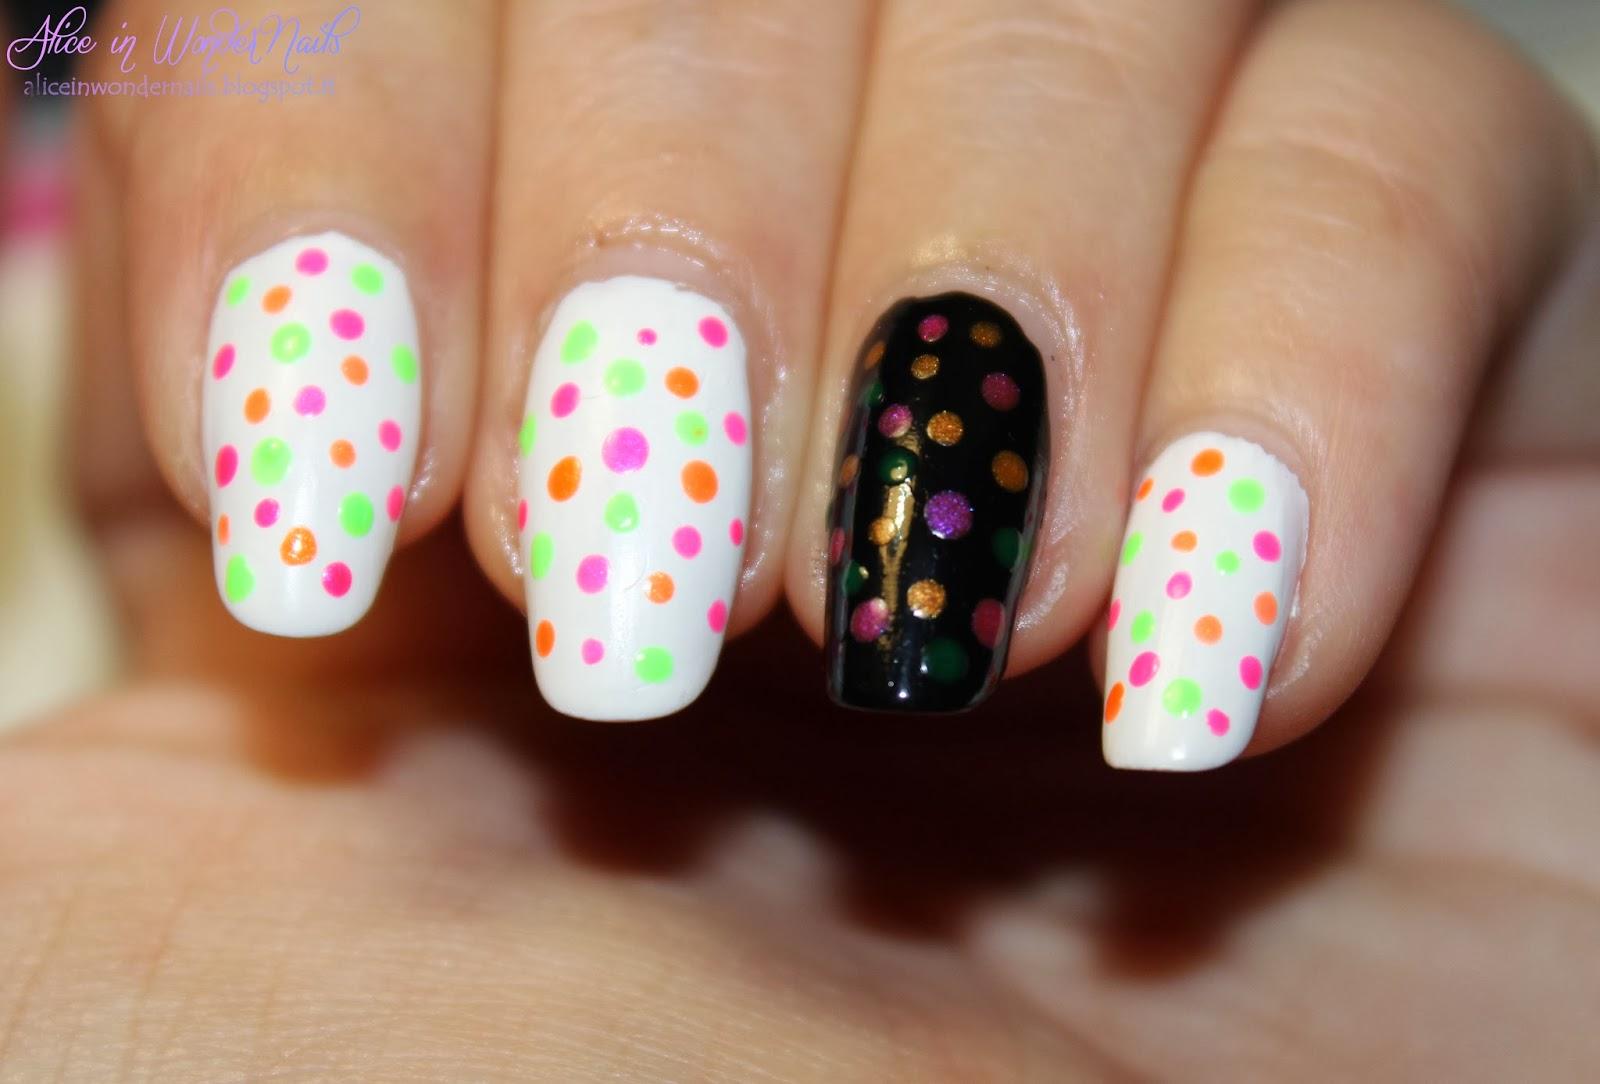 Nail Design With Confetti : Giardino d inverno confetti nail art by alice in wondernails on